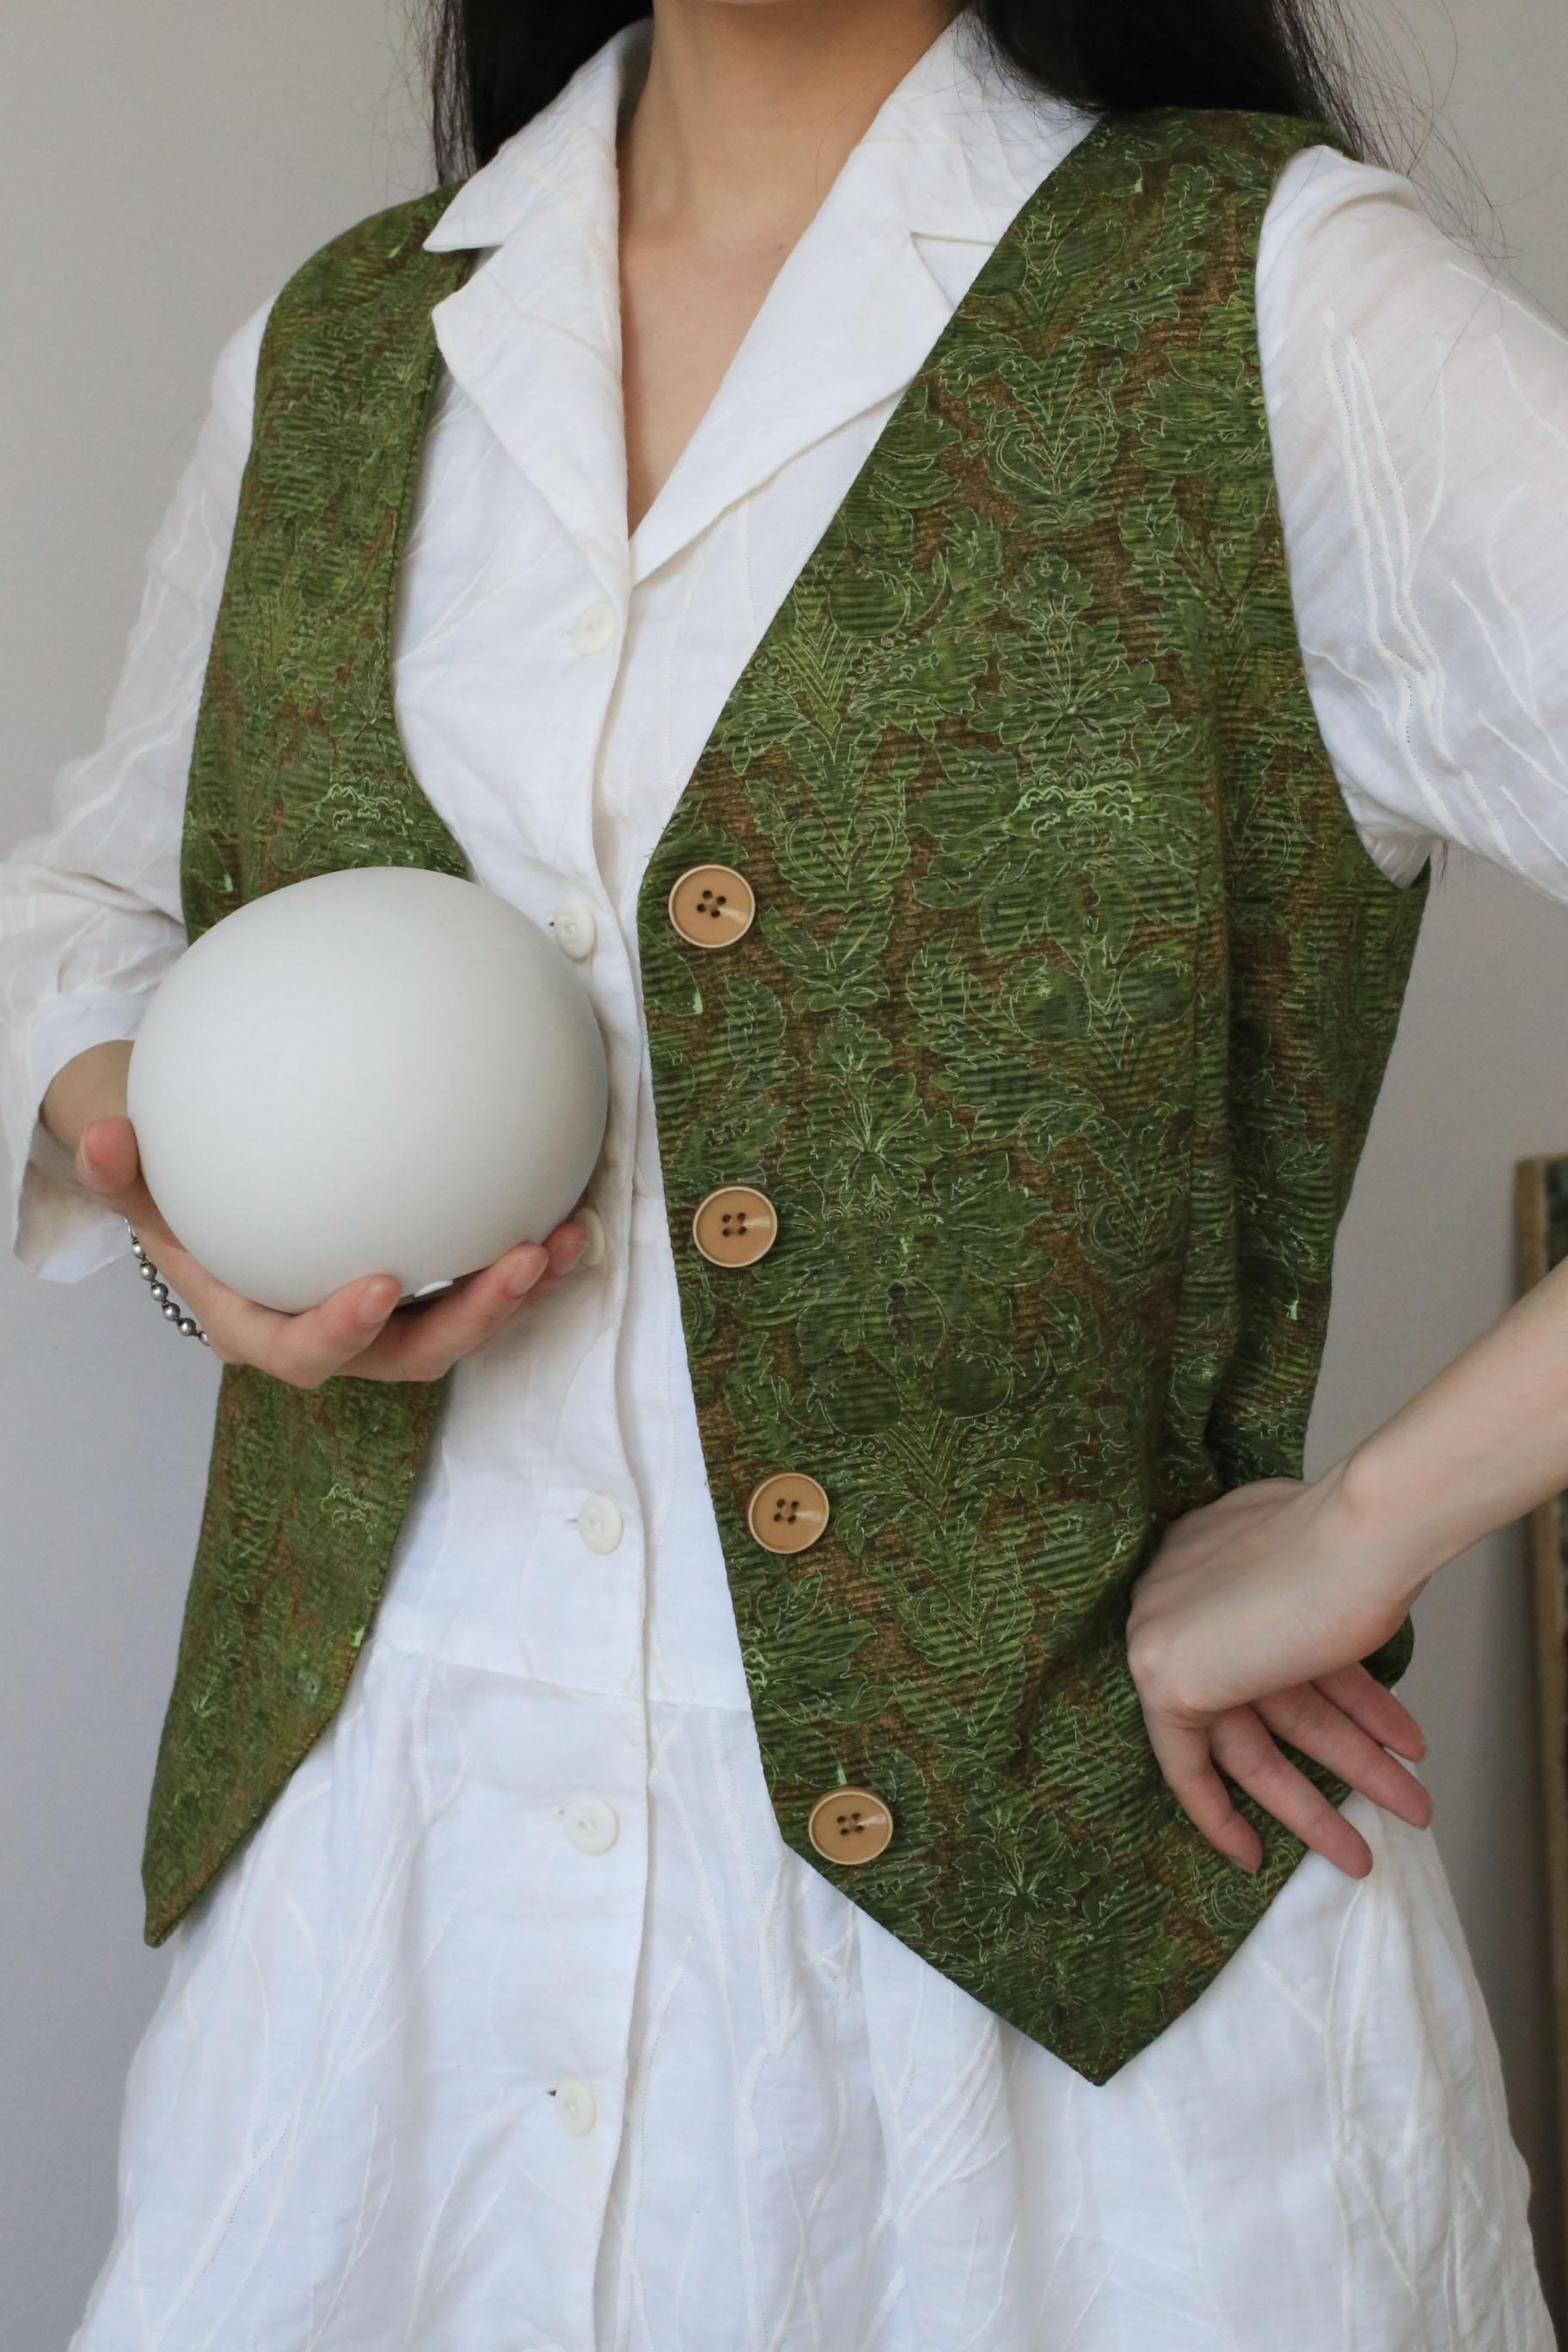 Tycs studio imported hemp cotton printing green rattan light shadow exclusive Limited sales vest